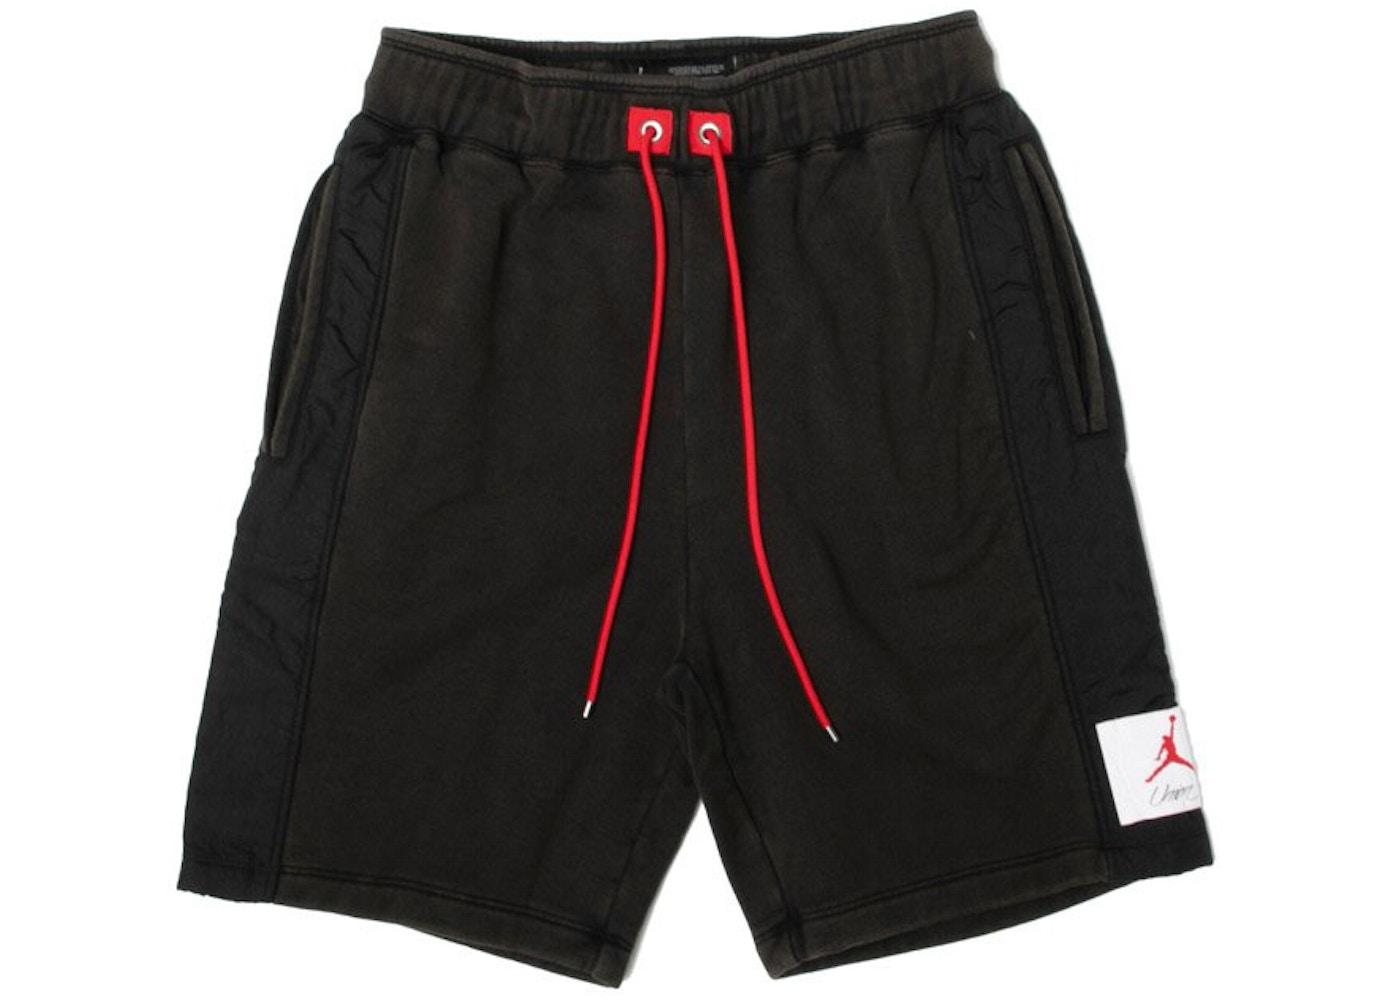 4c3618a92dad Jordan x Union NRG Vault AJ Flight Shorts Black - FW18